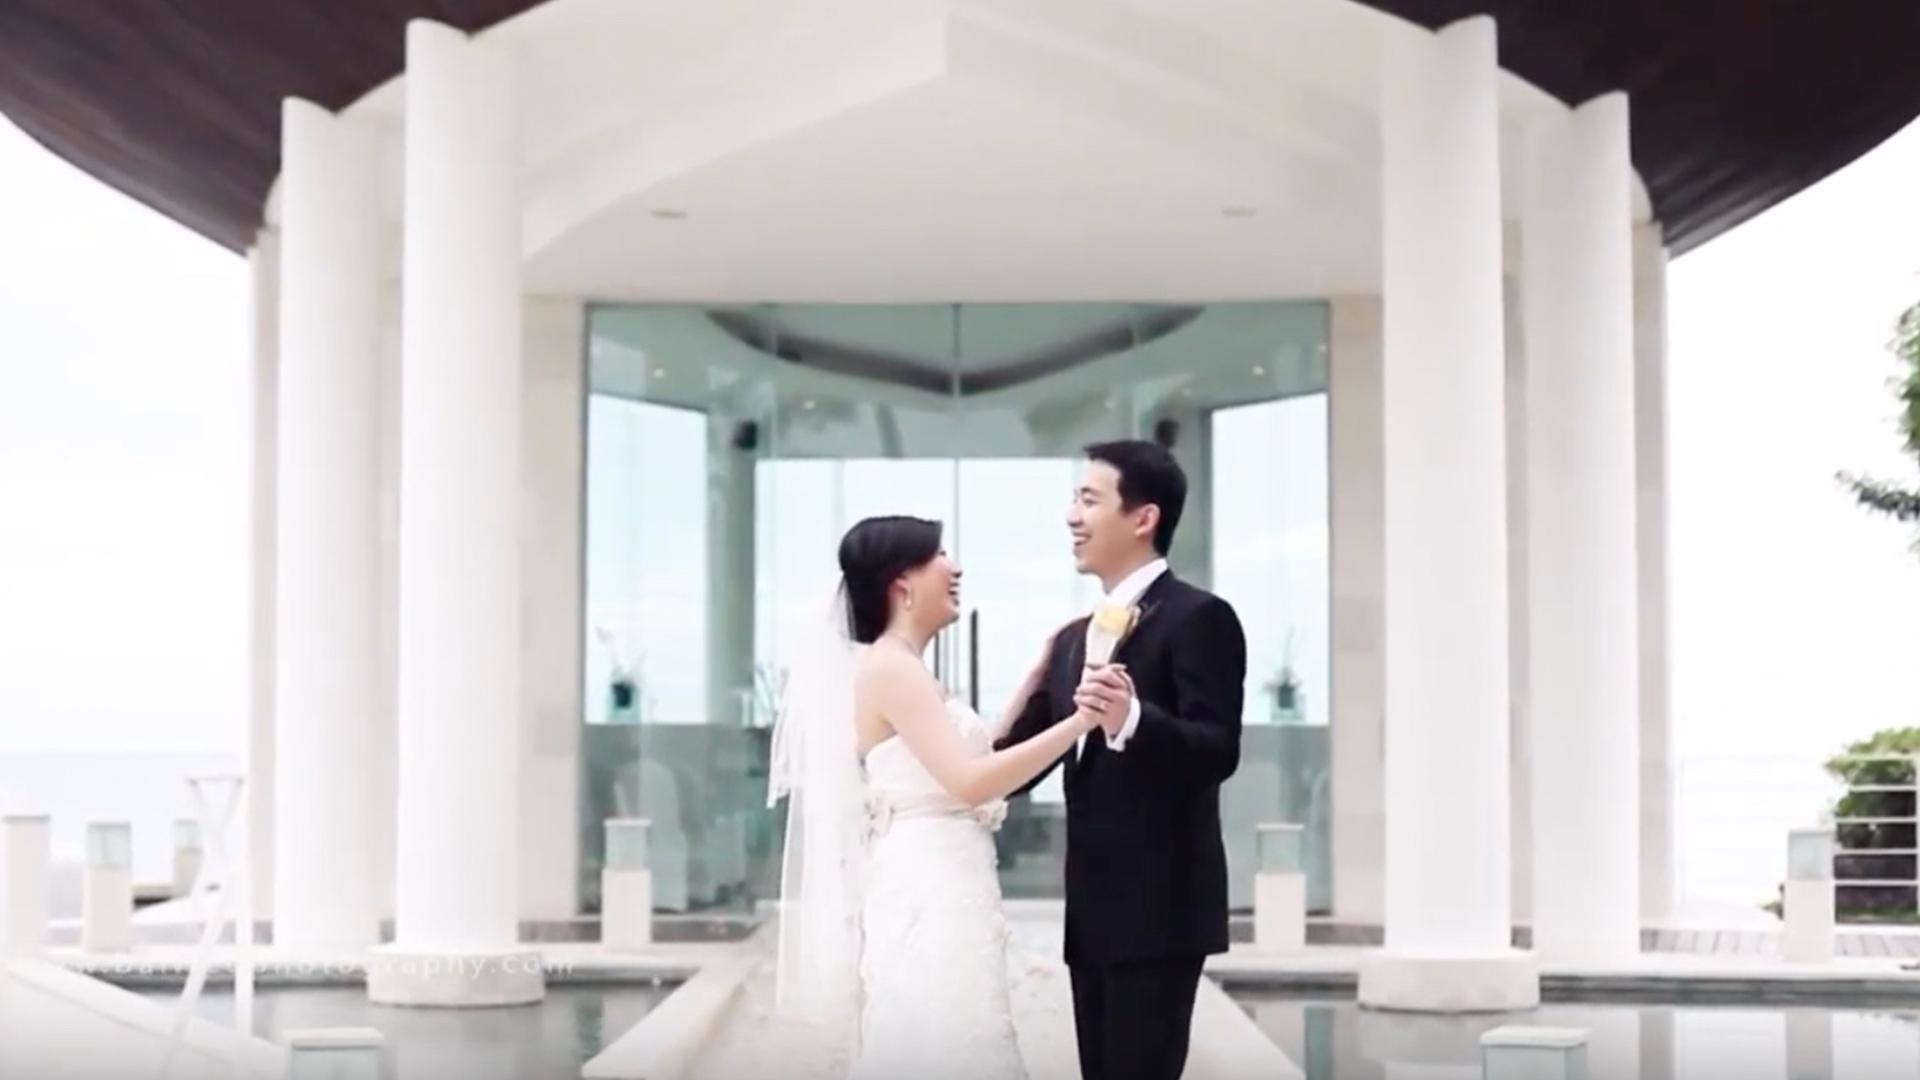 Nusa dua bali wedding